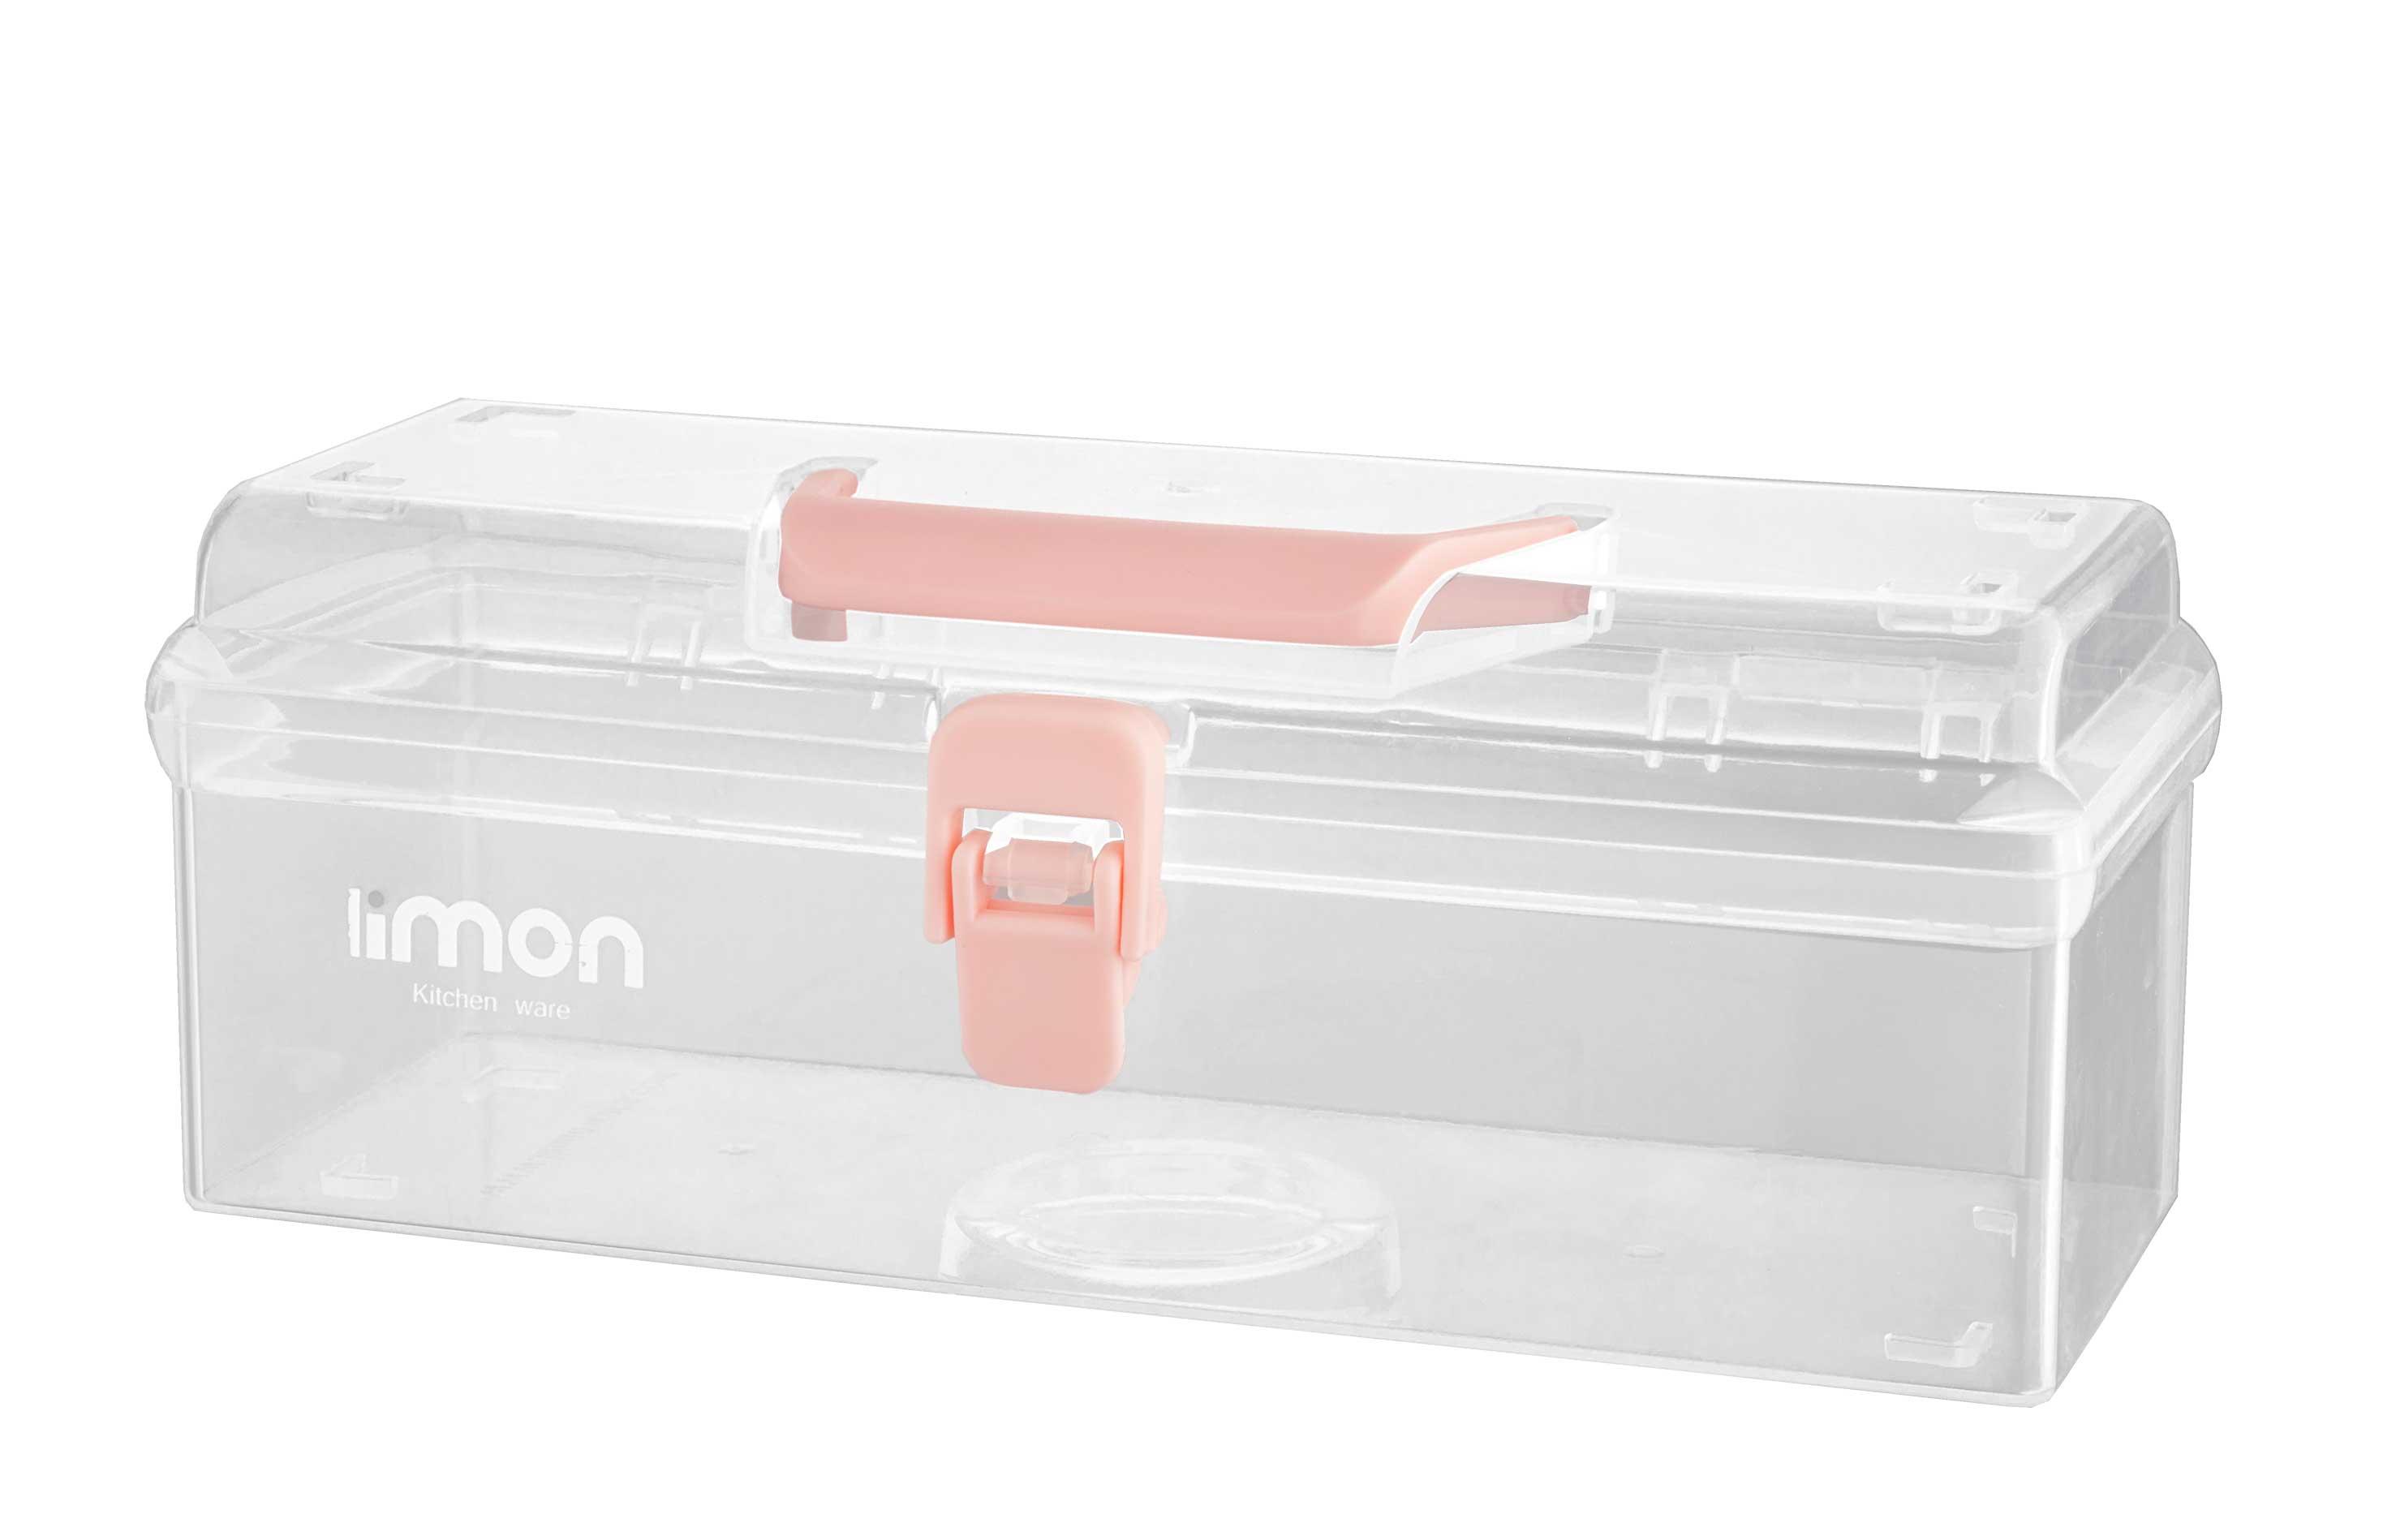 جعبه مستطیل لیمون 1